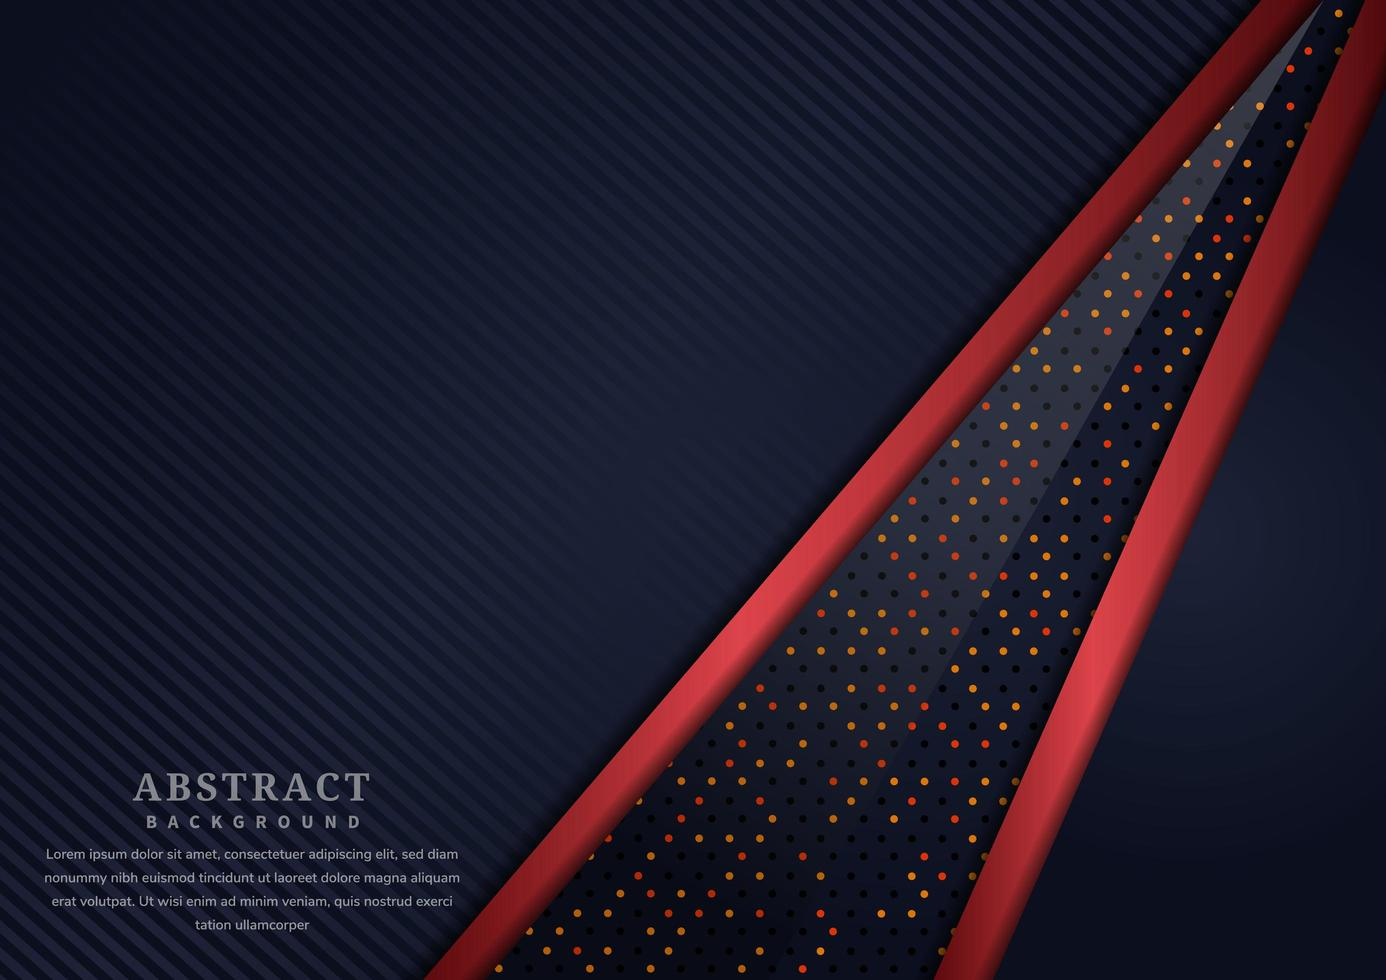 capa superpuesta negra diagonal abstracta con fondo de borde rojo vector